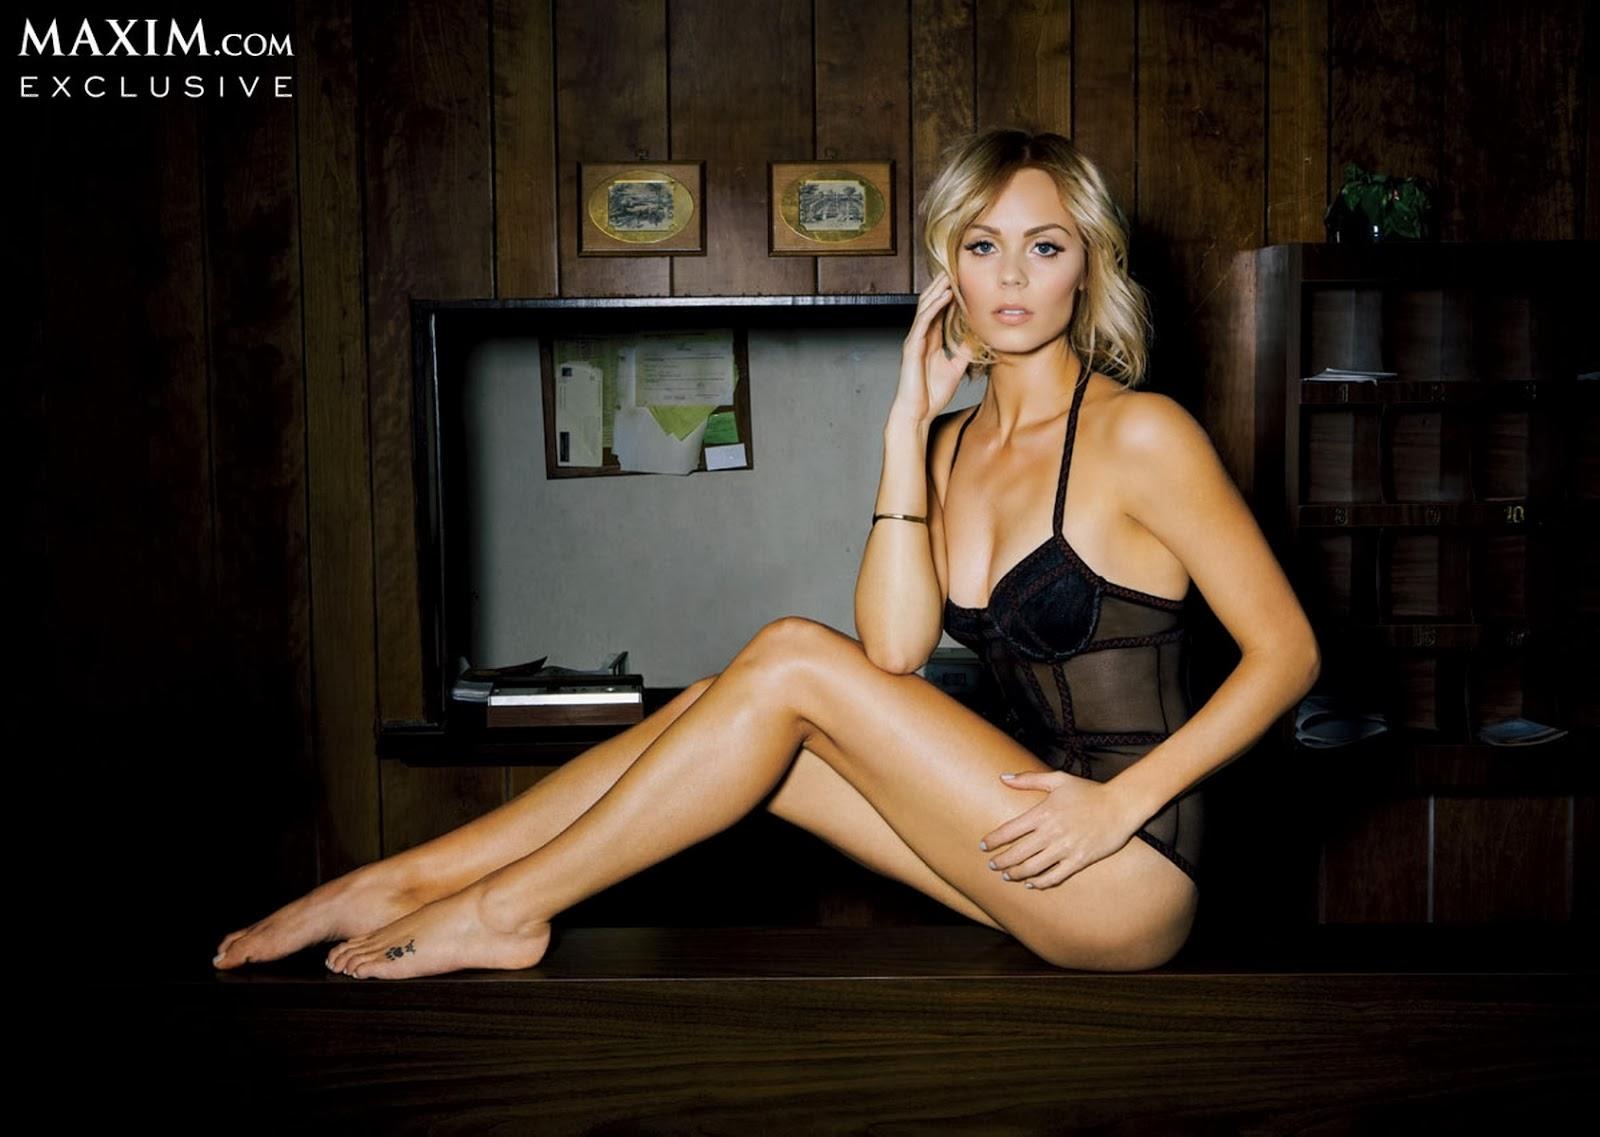 Laura Vandervoort en Maxim por el exito de Bitten 2